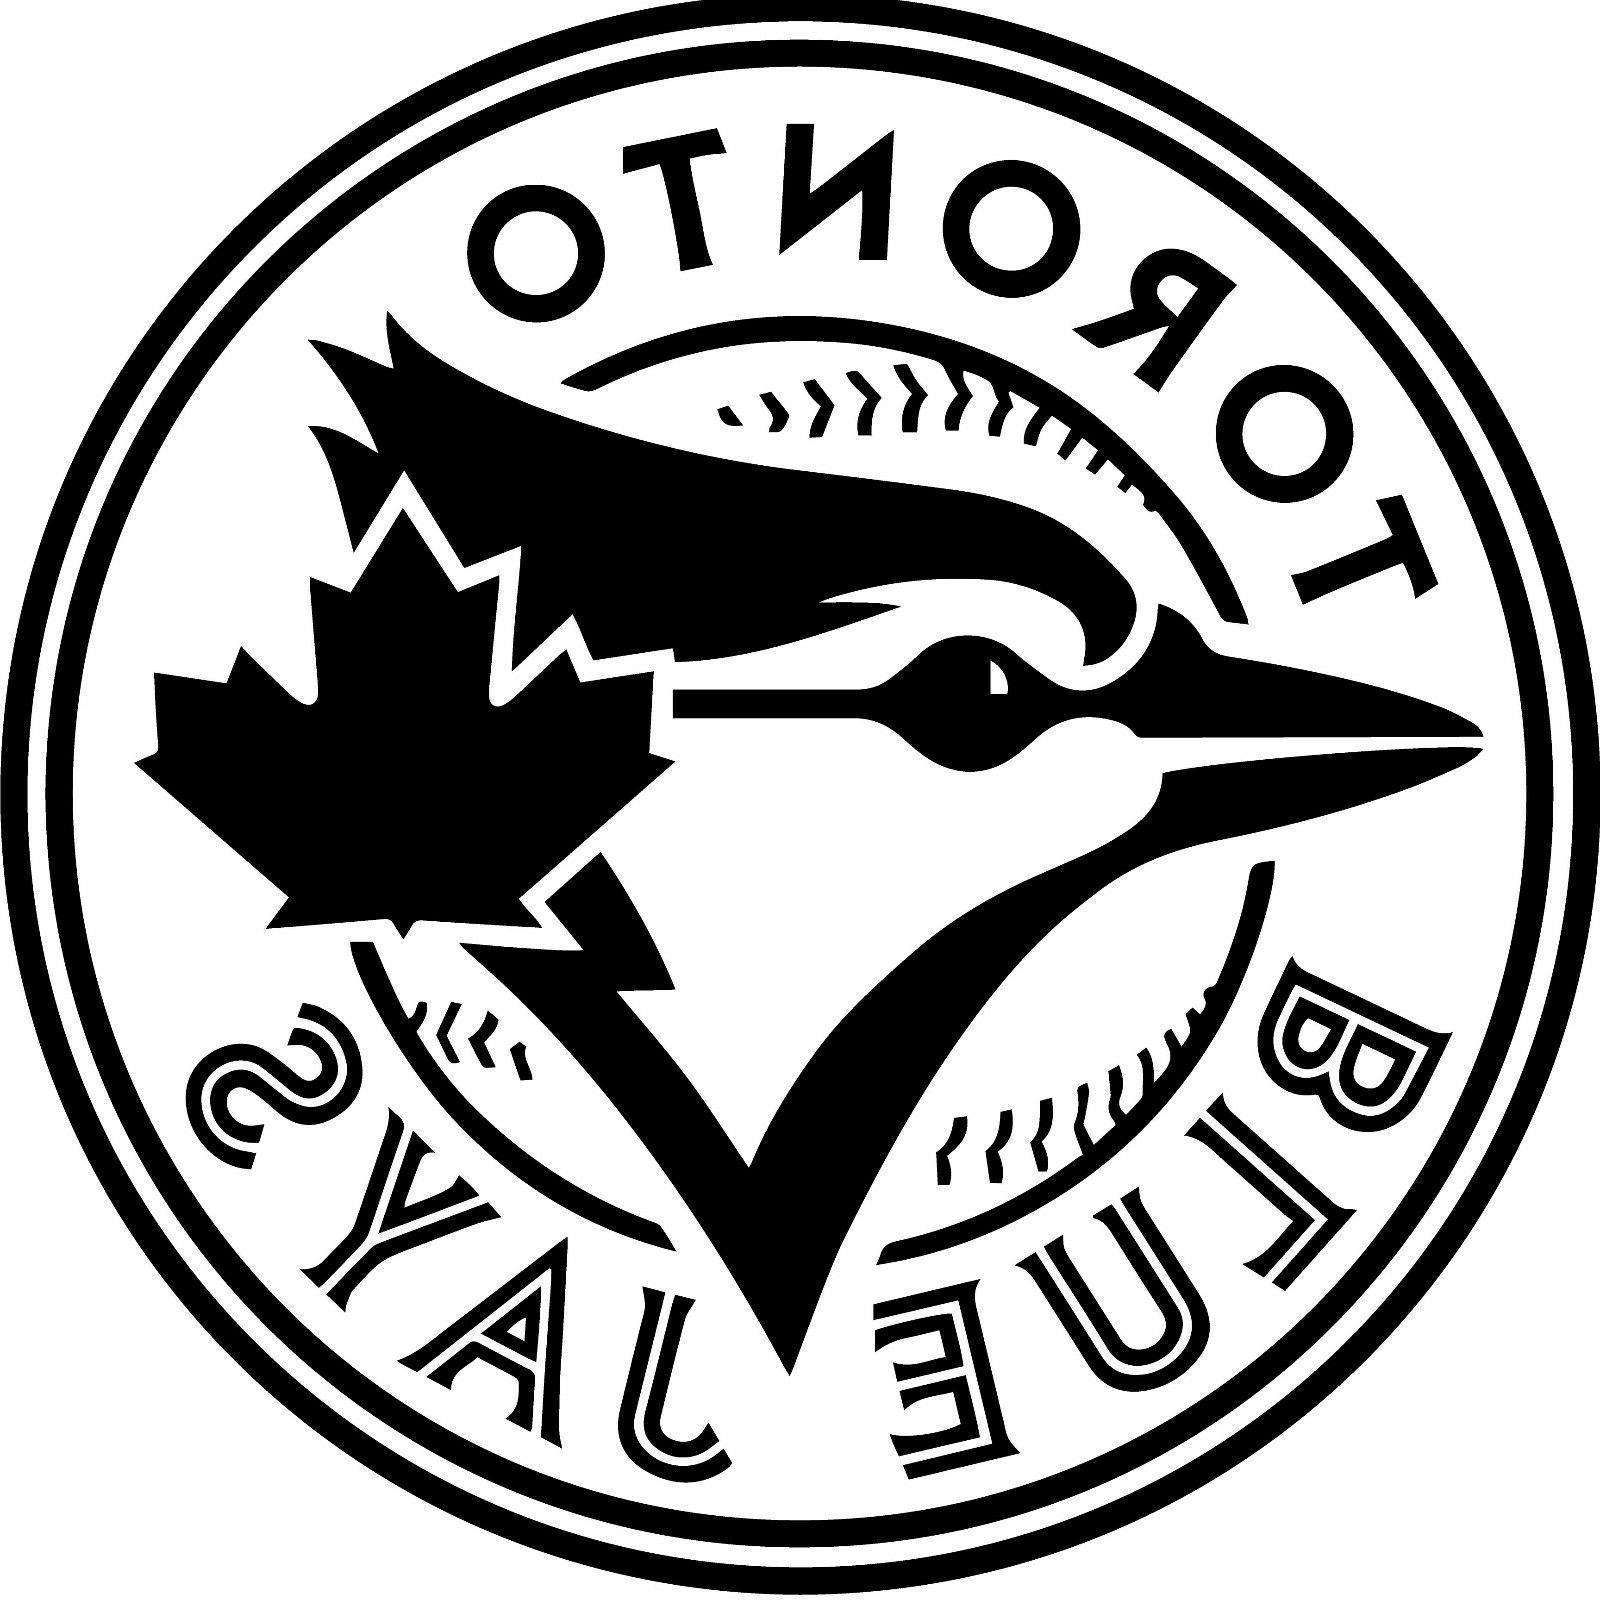 Toronto Logo Wall Decal MLB Sticker Vinyl CG493